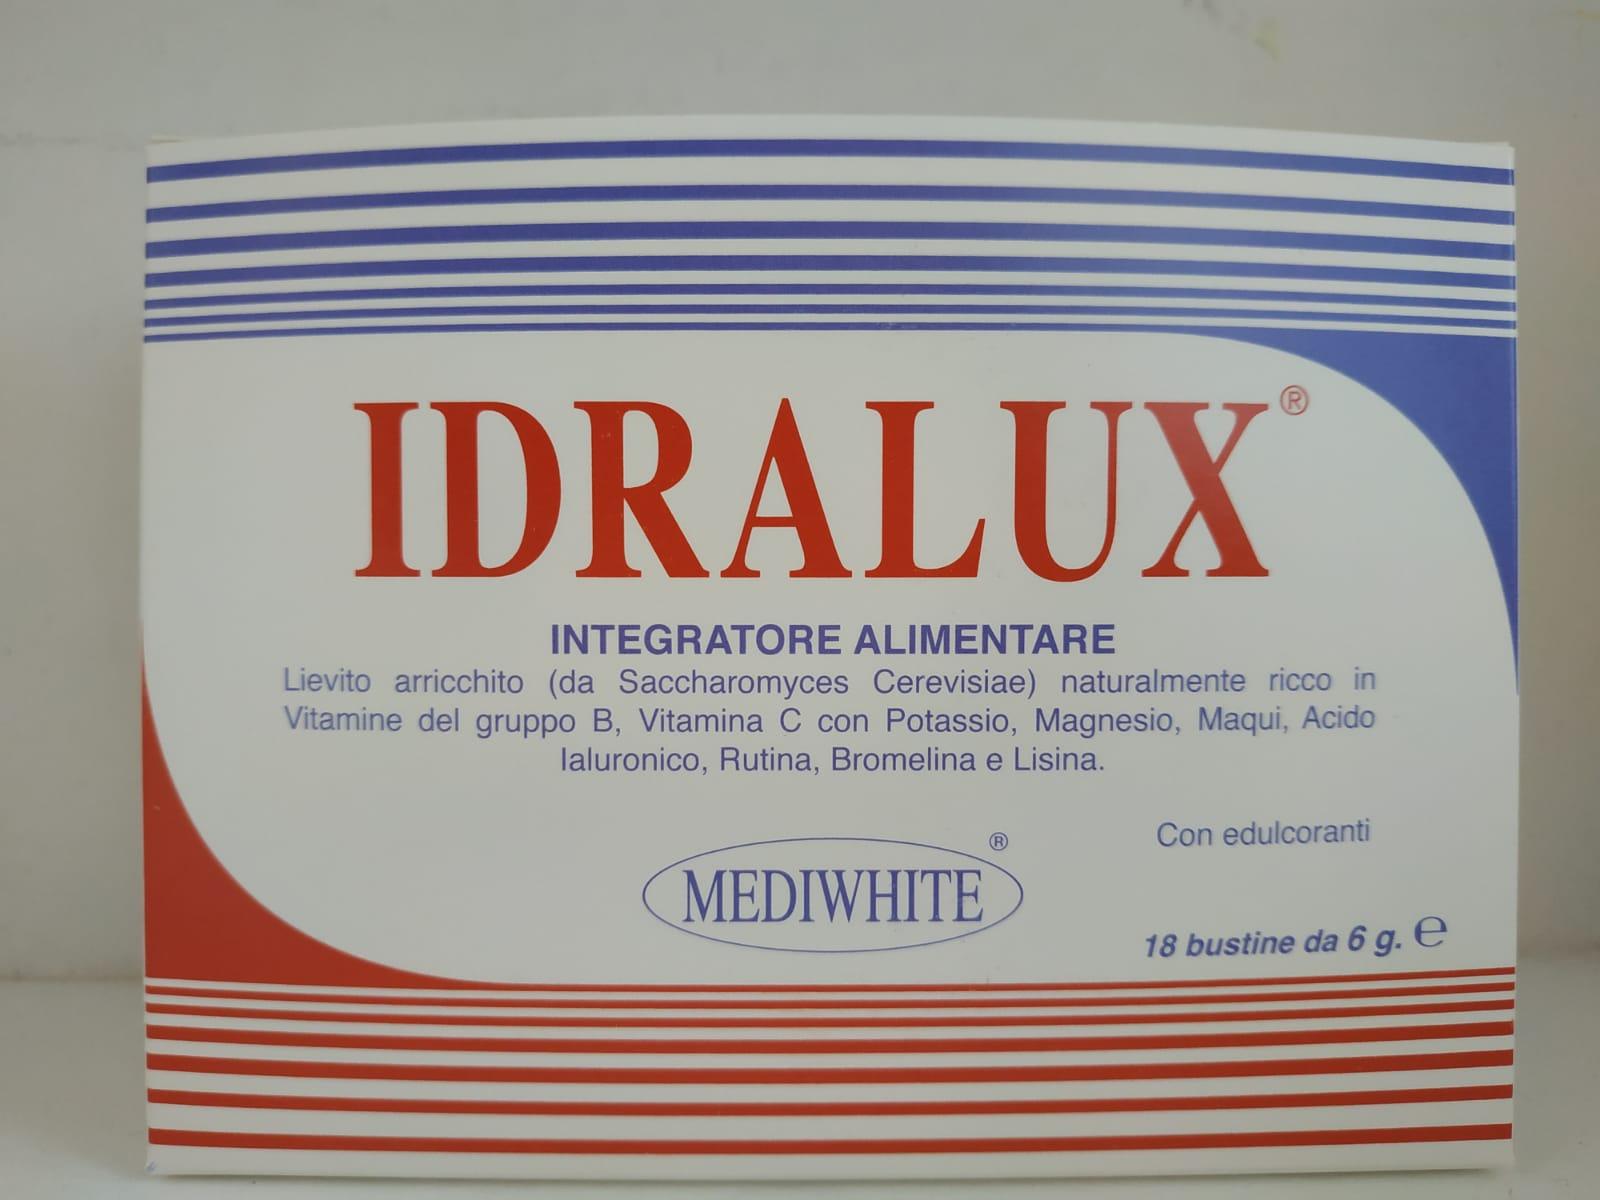 IDRALUX 18 BUSTINE